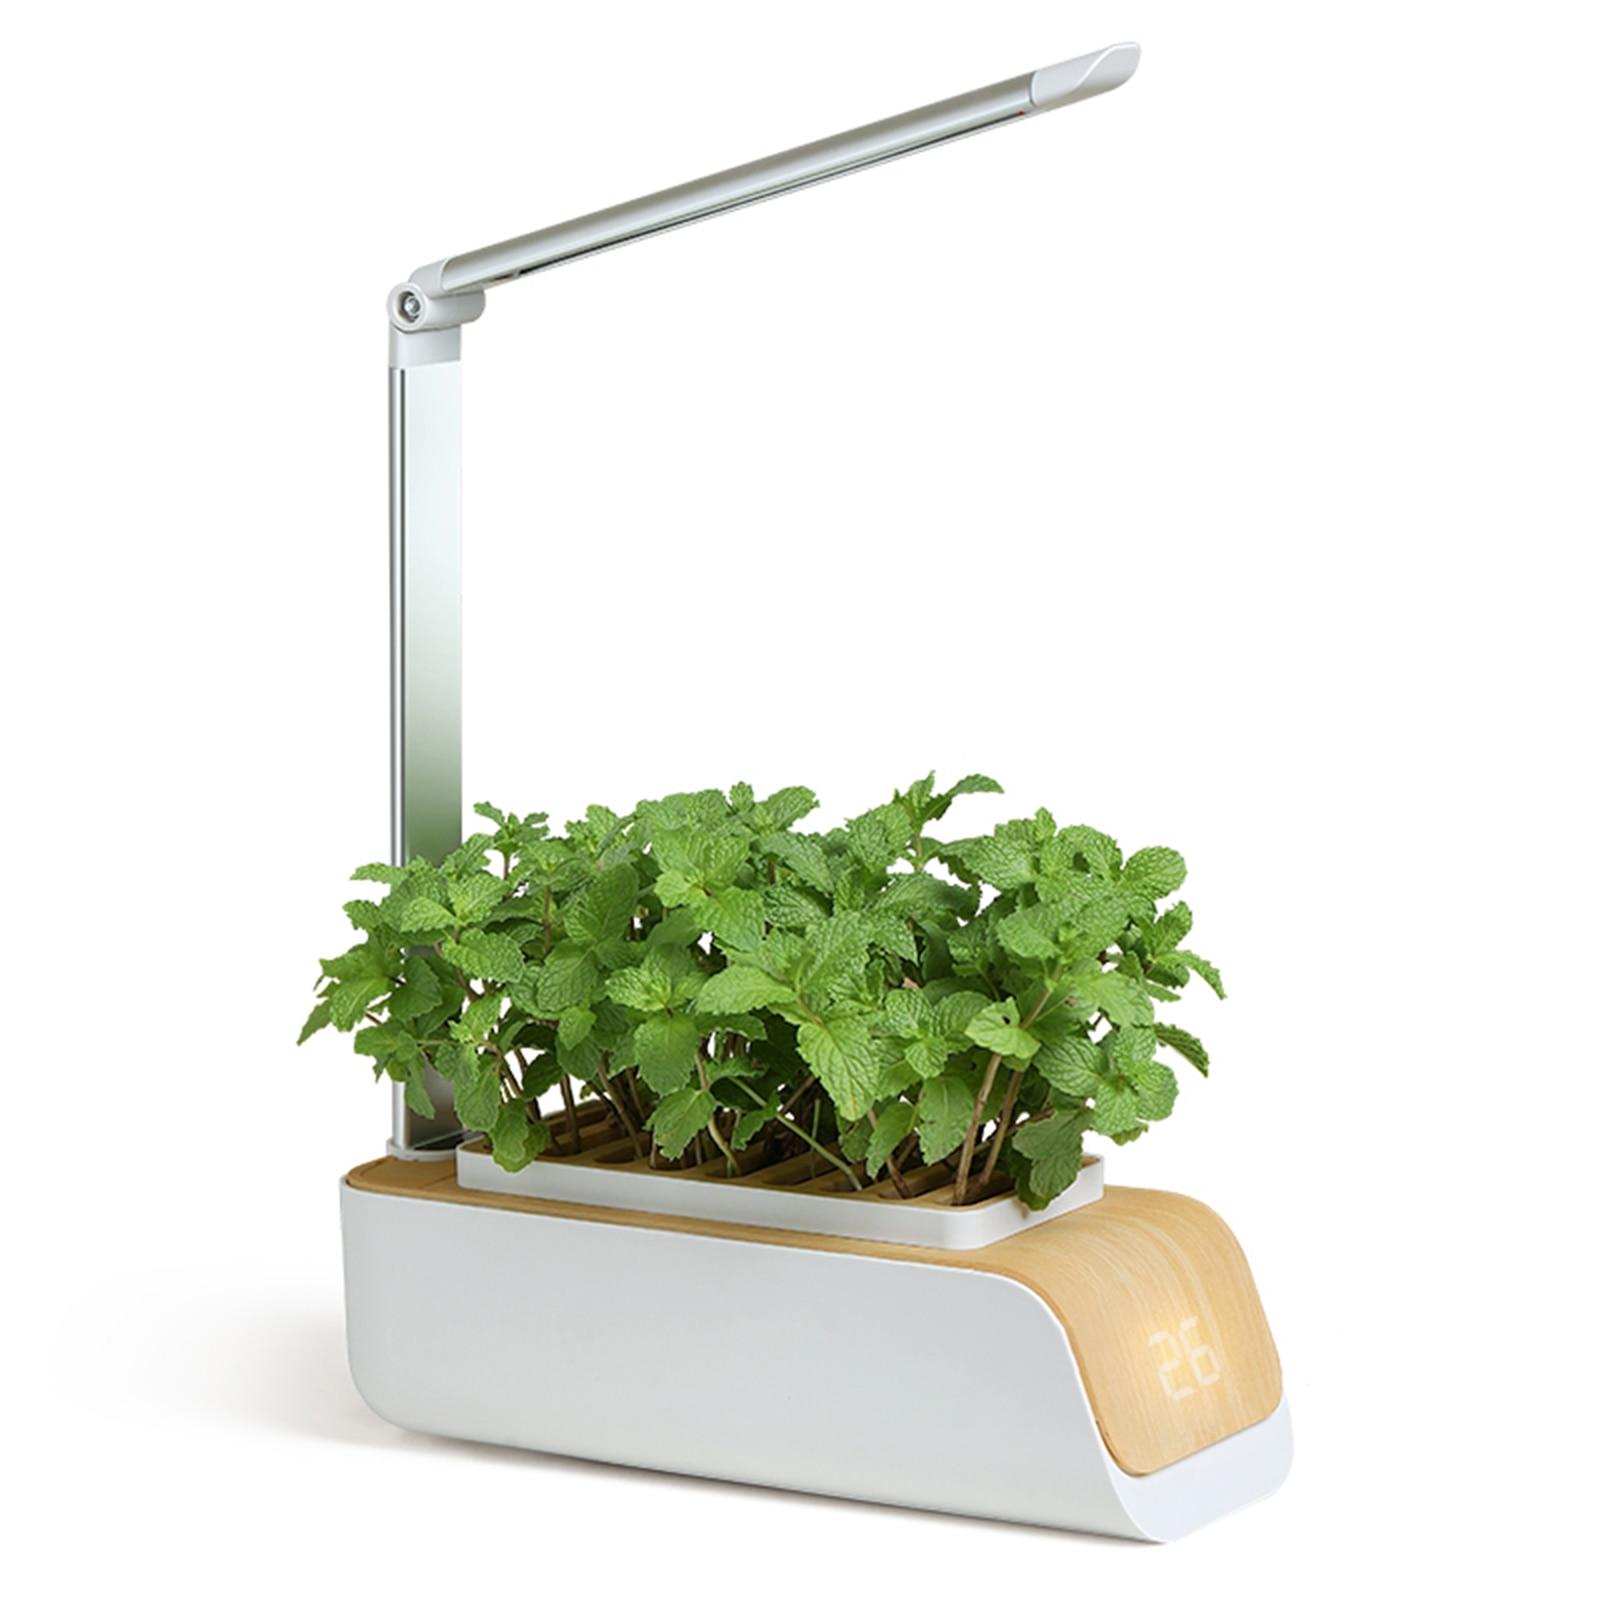 Hydroponics Growing System Garden Smart Garden Planter LED Grow Light Kit